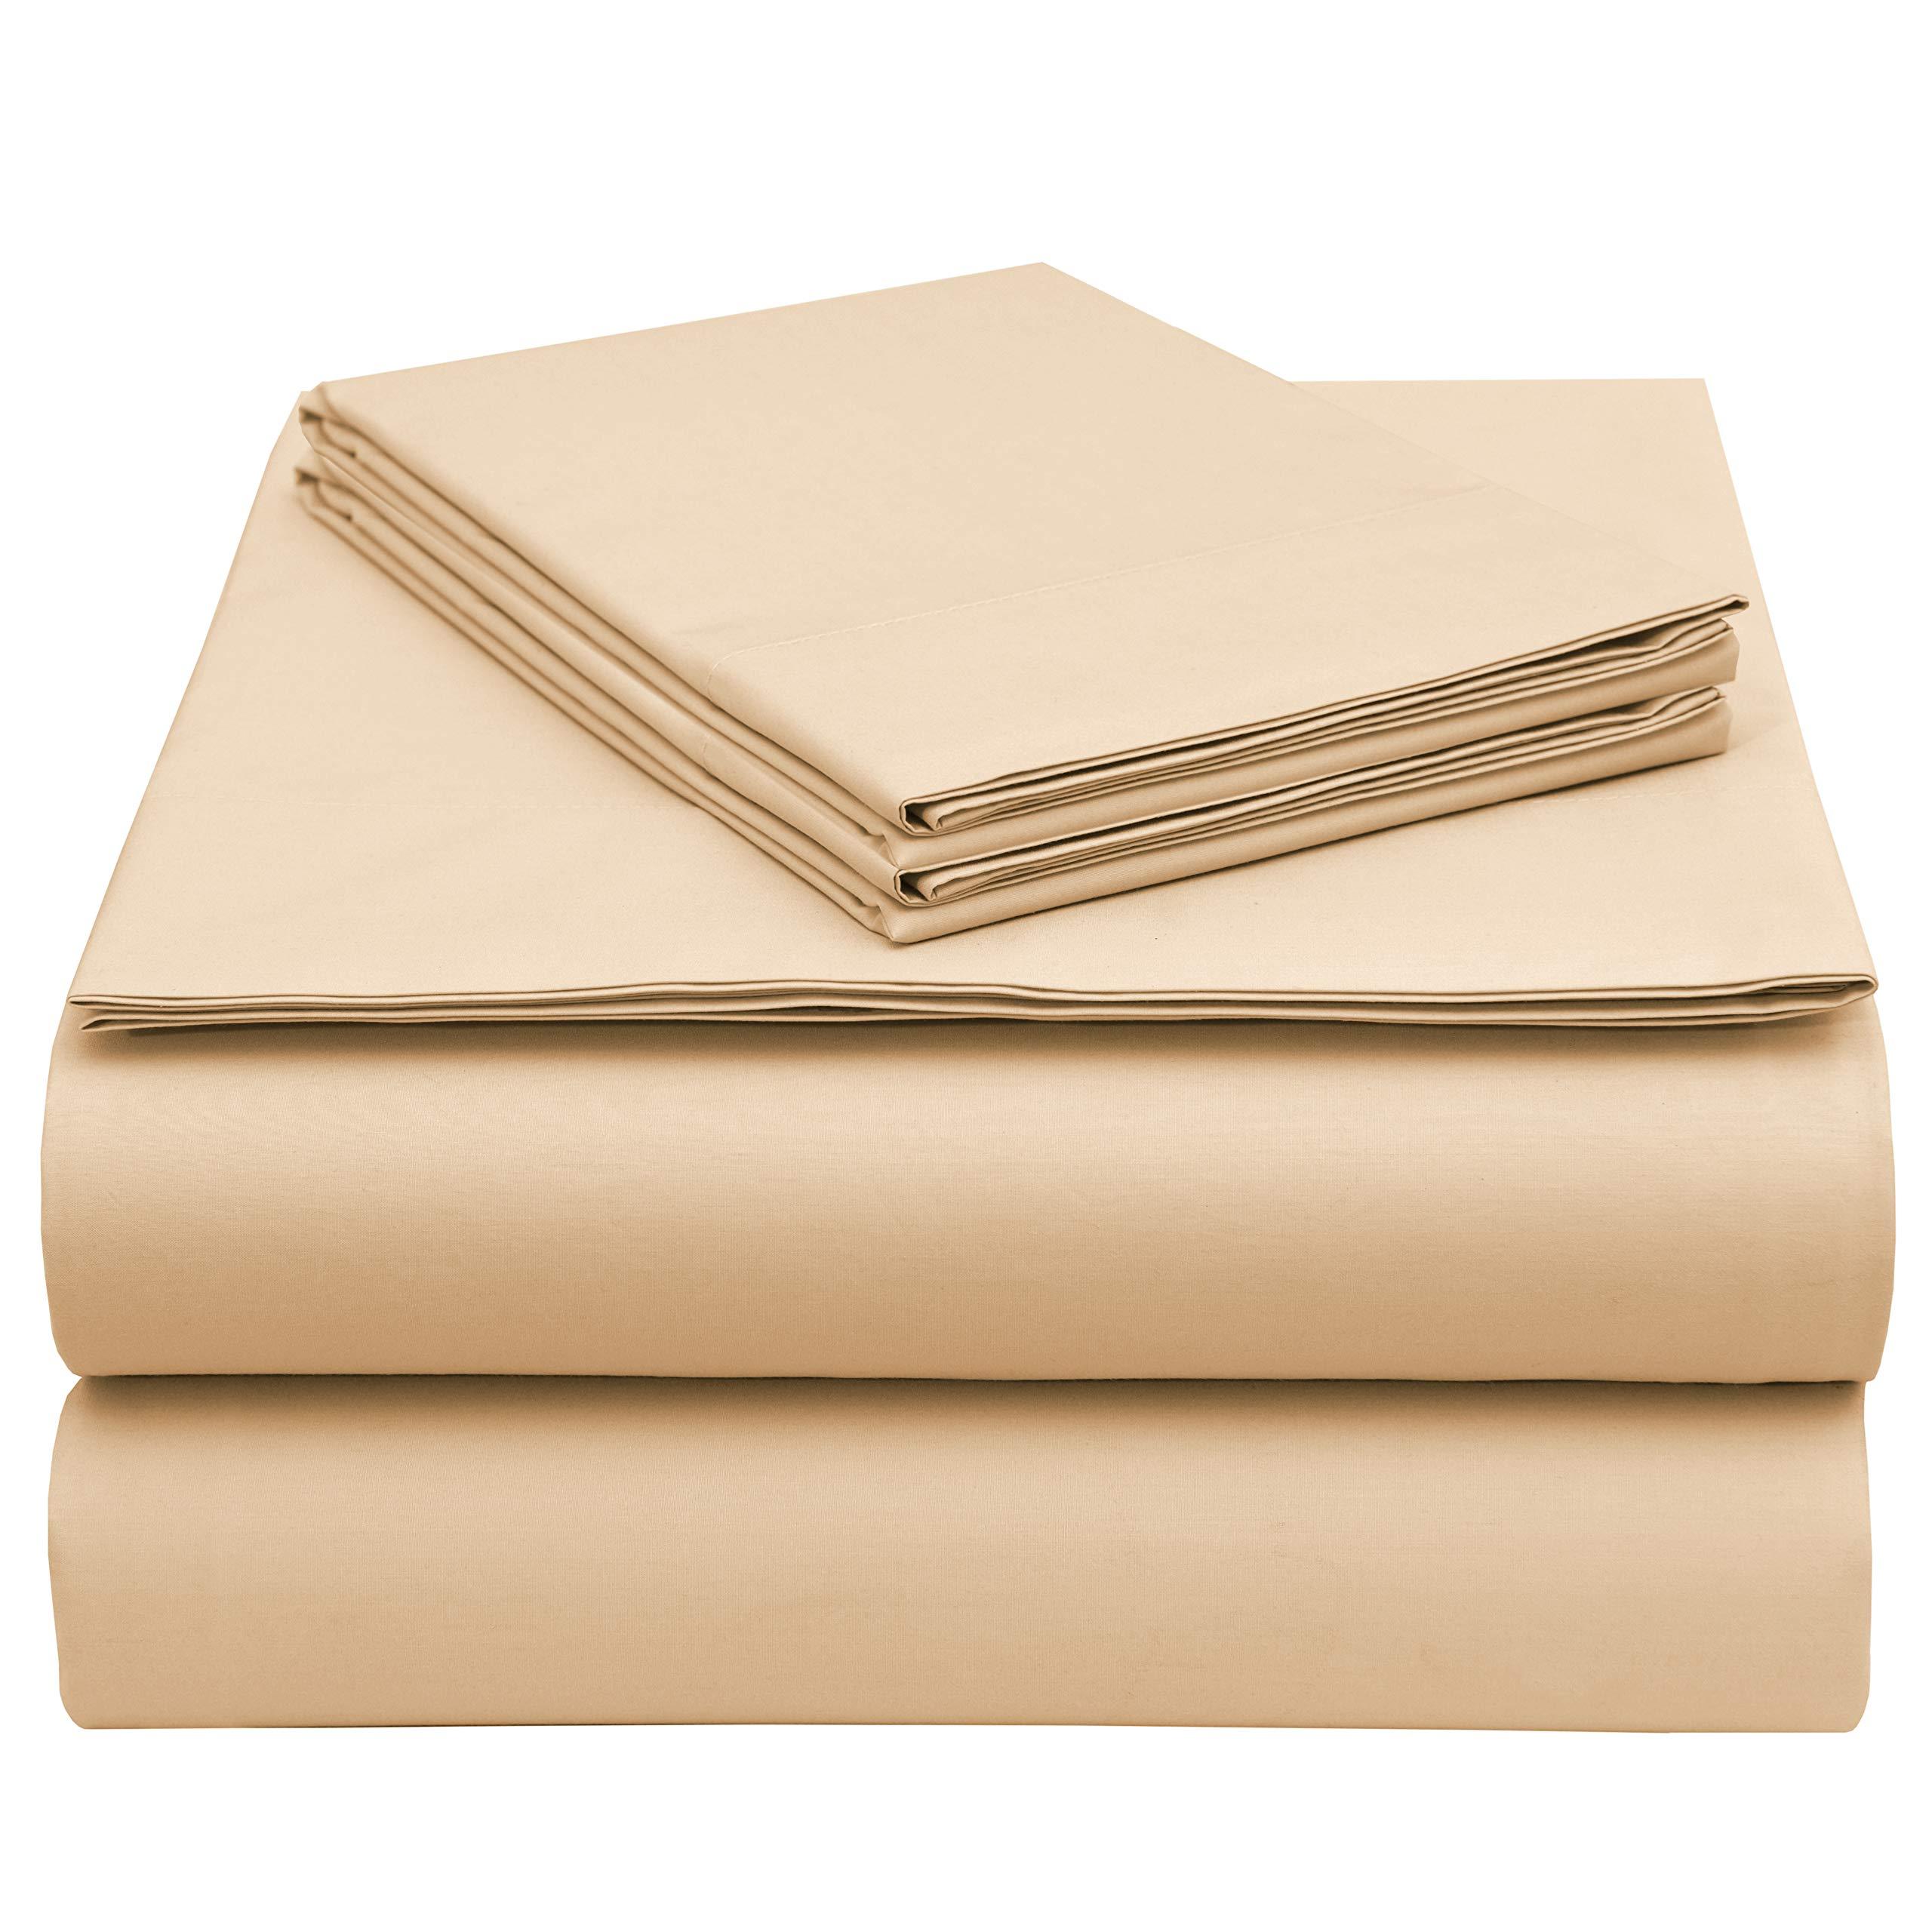 EnvioHome GOTS Certified Organic Cotton Sheet Set - 4 Piece - Ivory, Queen